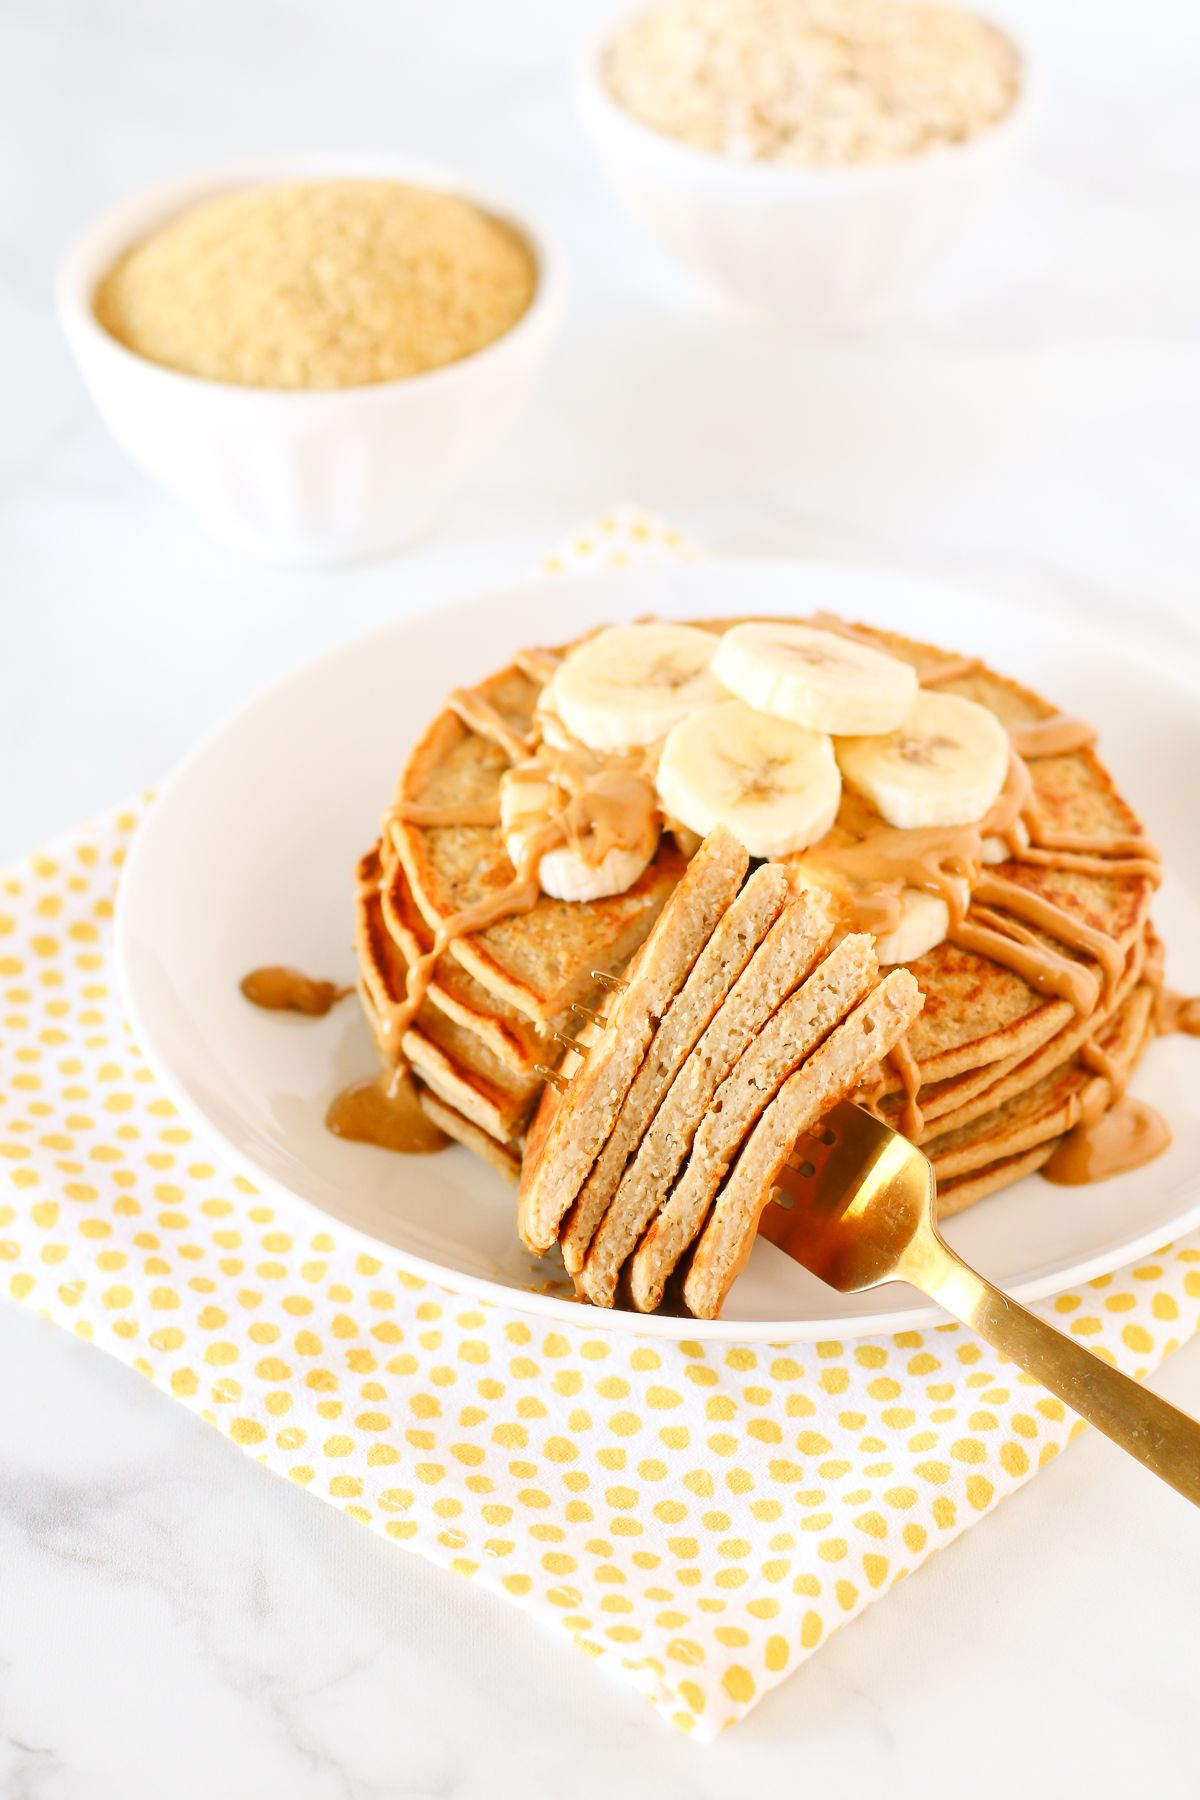 Gluten free vegan banana oat blender pancakes Recipe